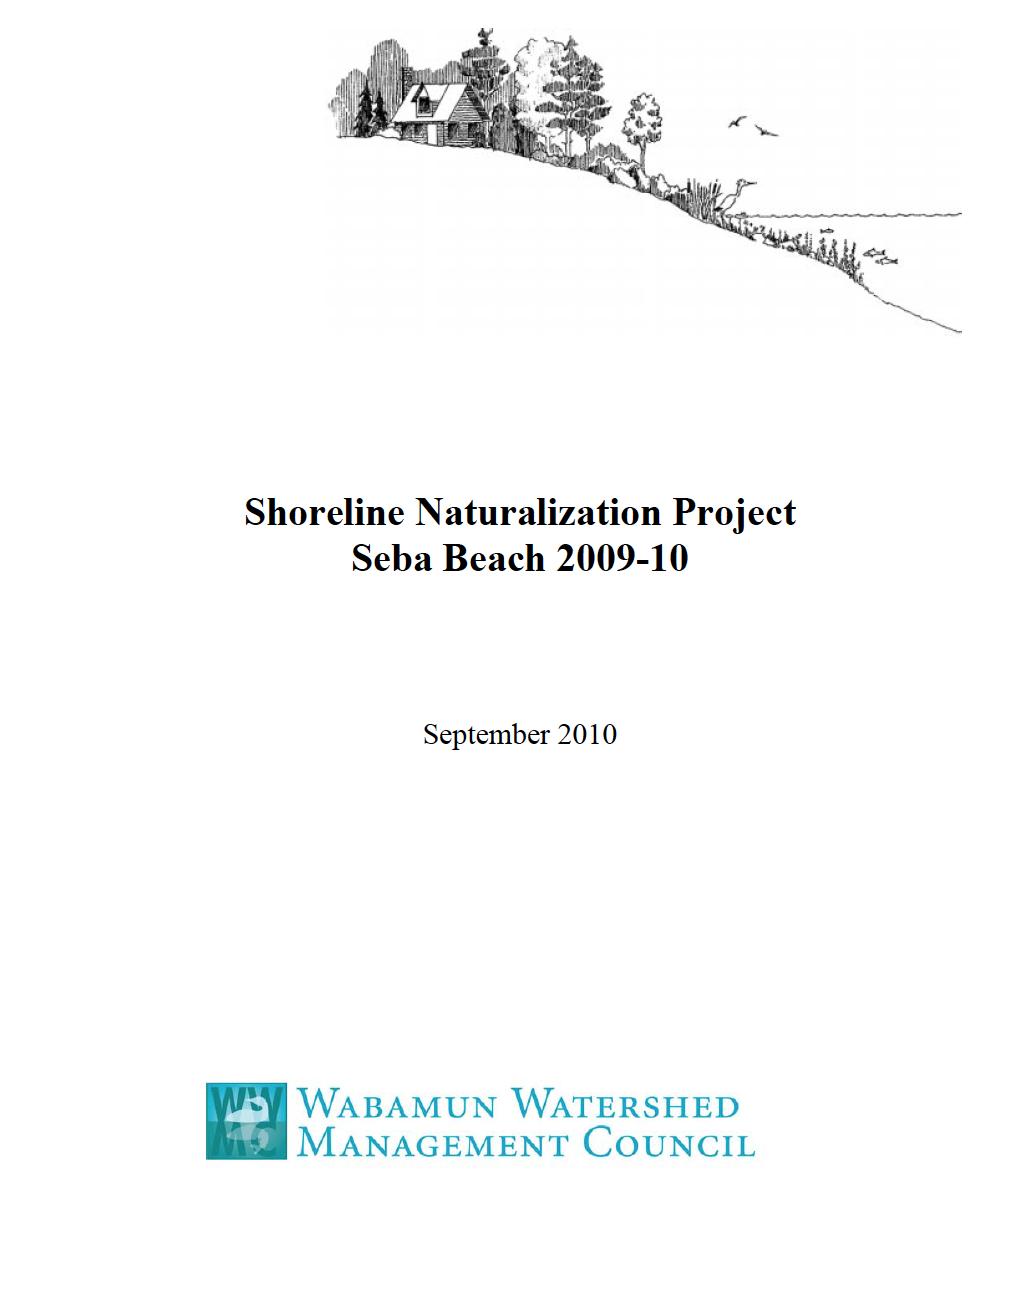 Shoreline Naturalization Project Seba Beach.png